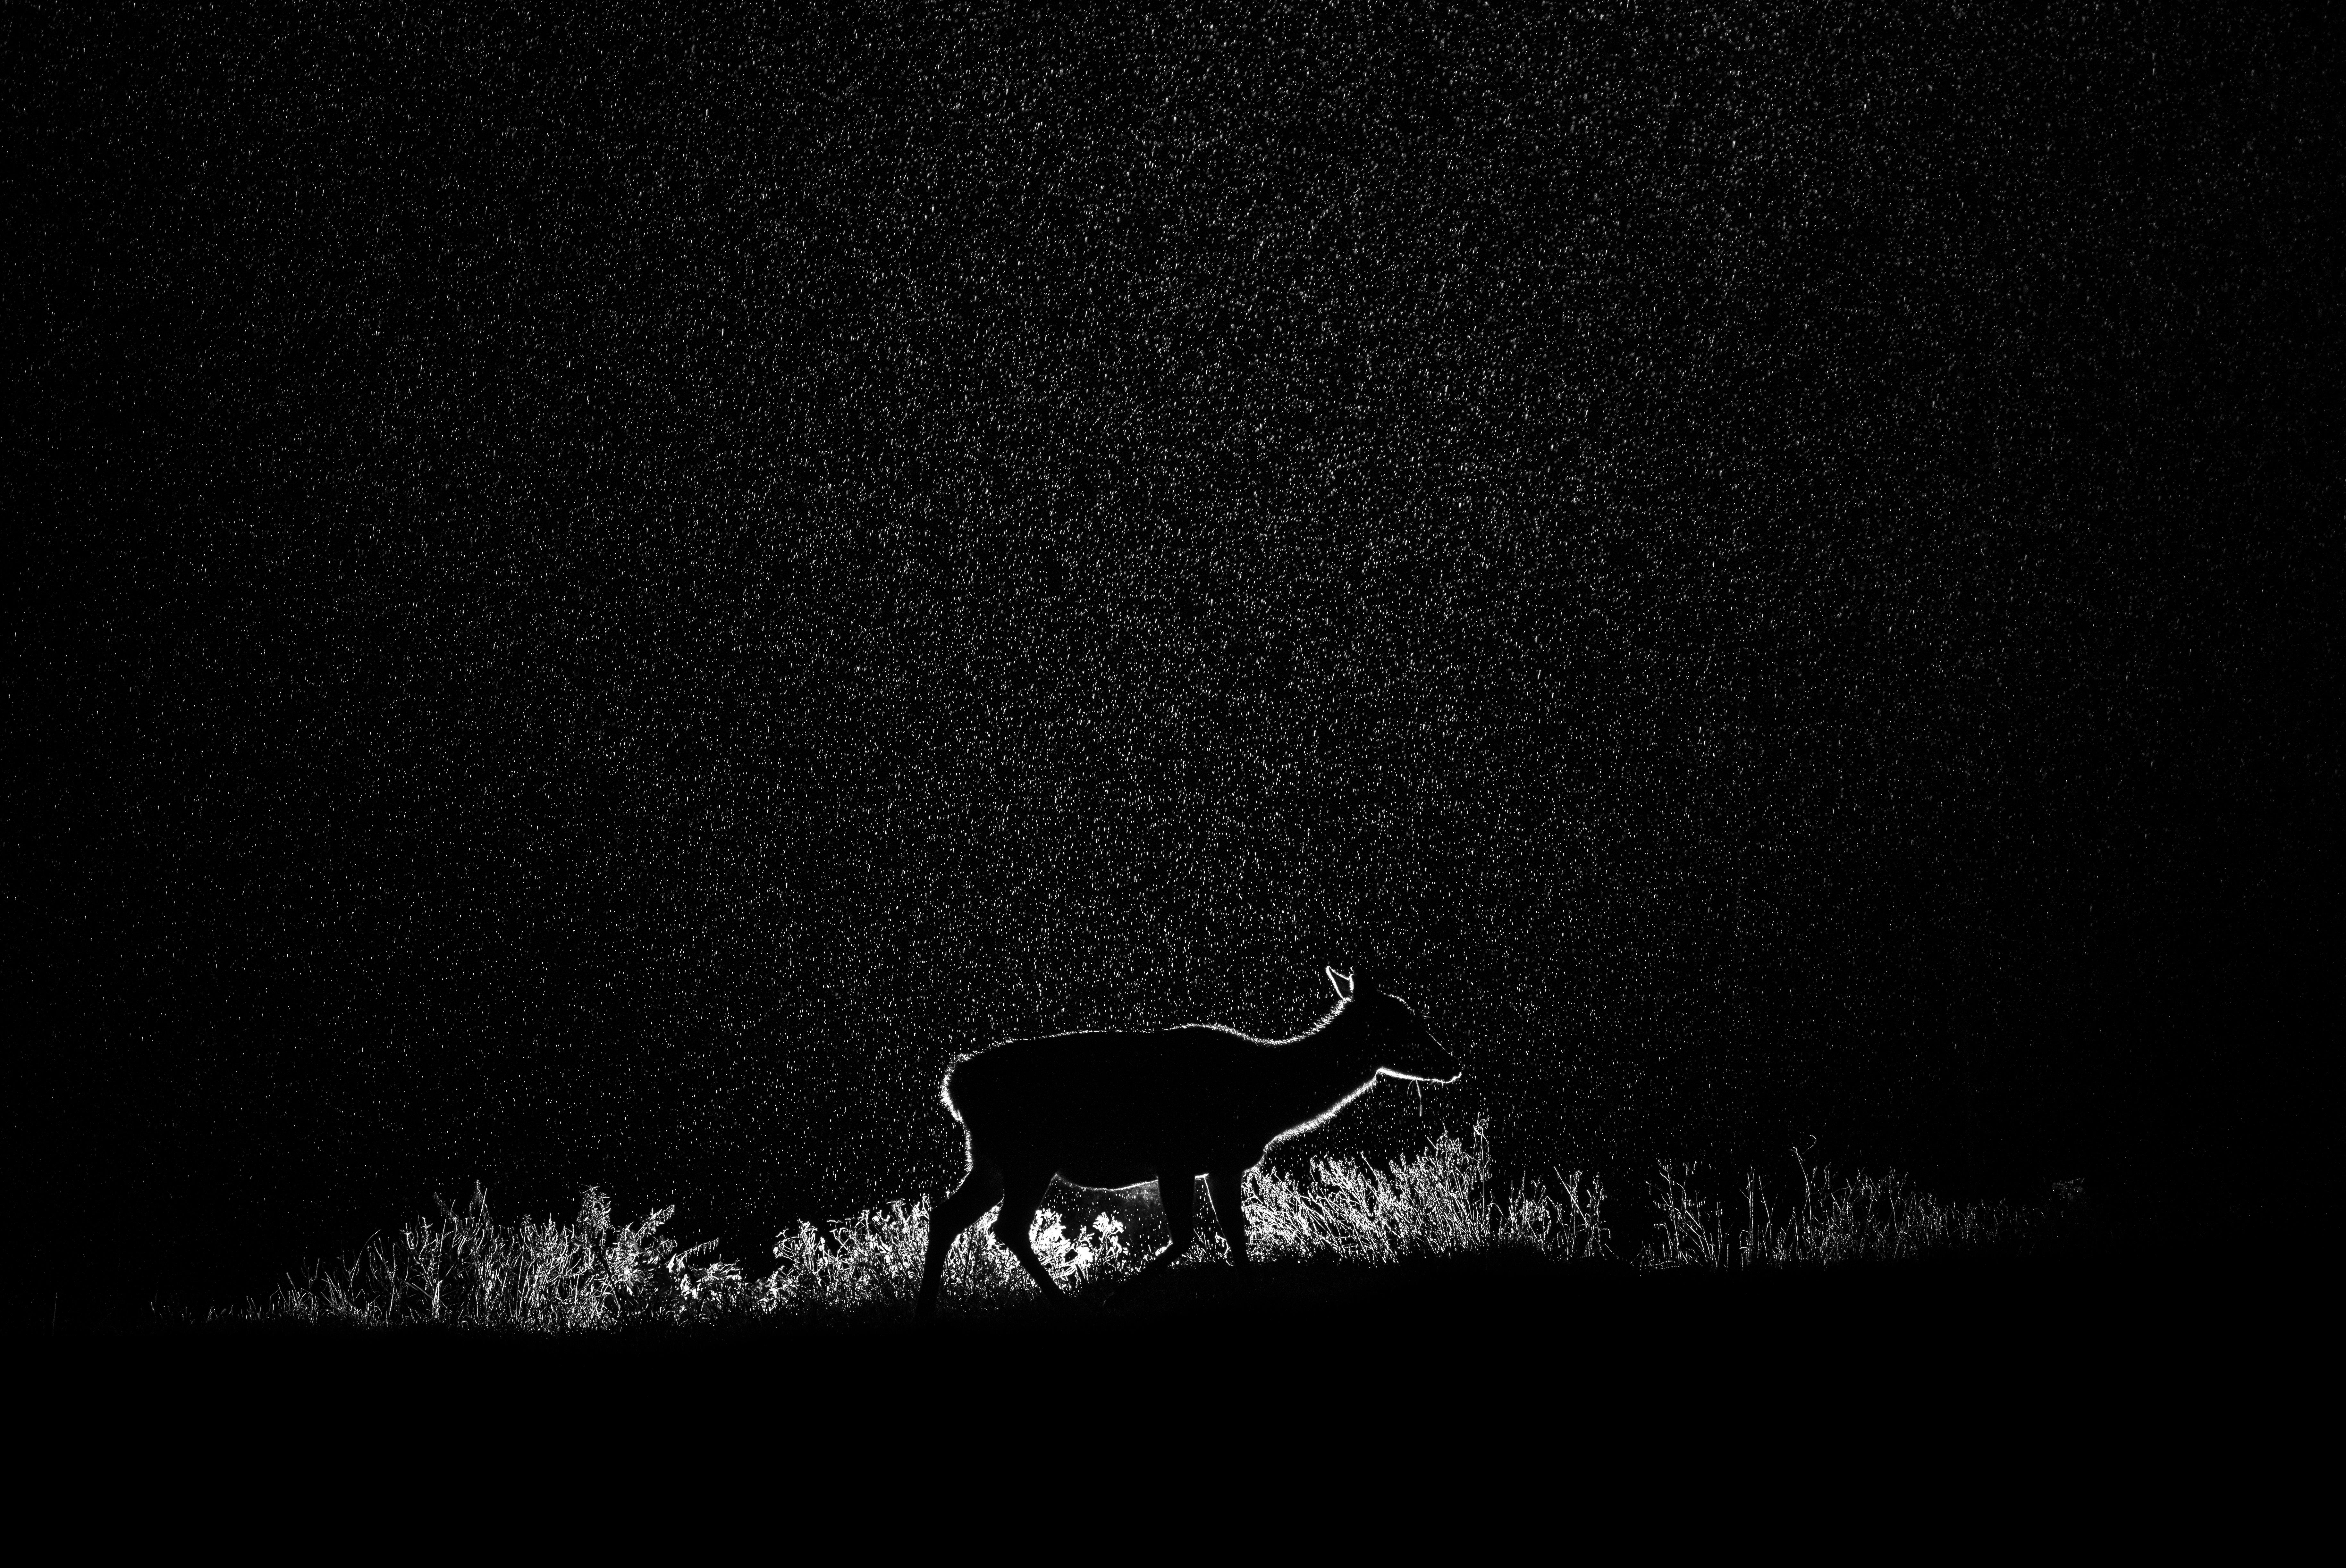 Deer in heavy rainfall